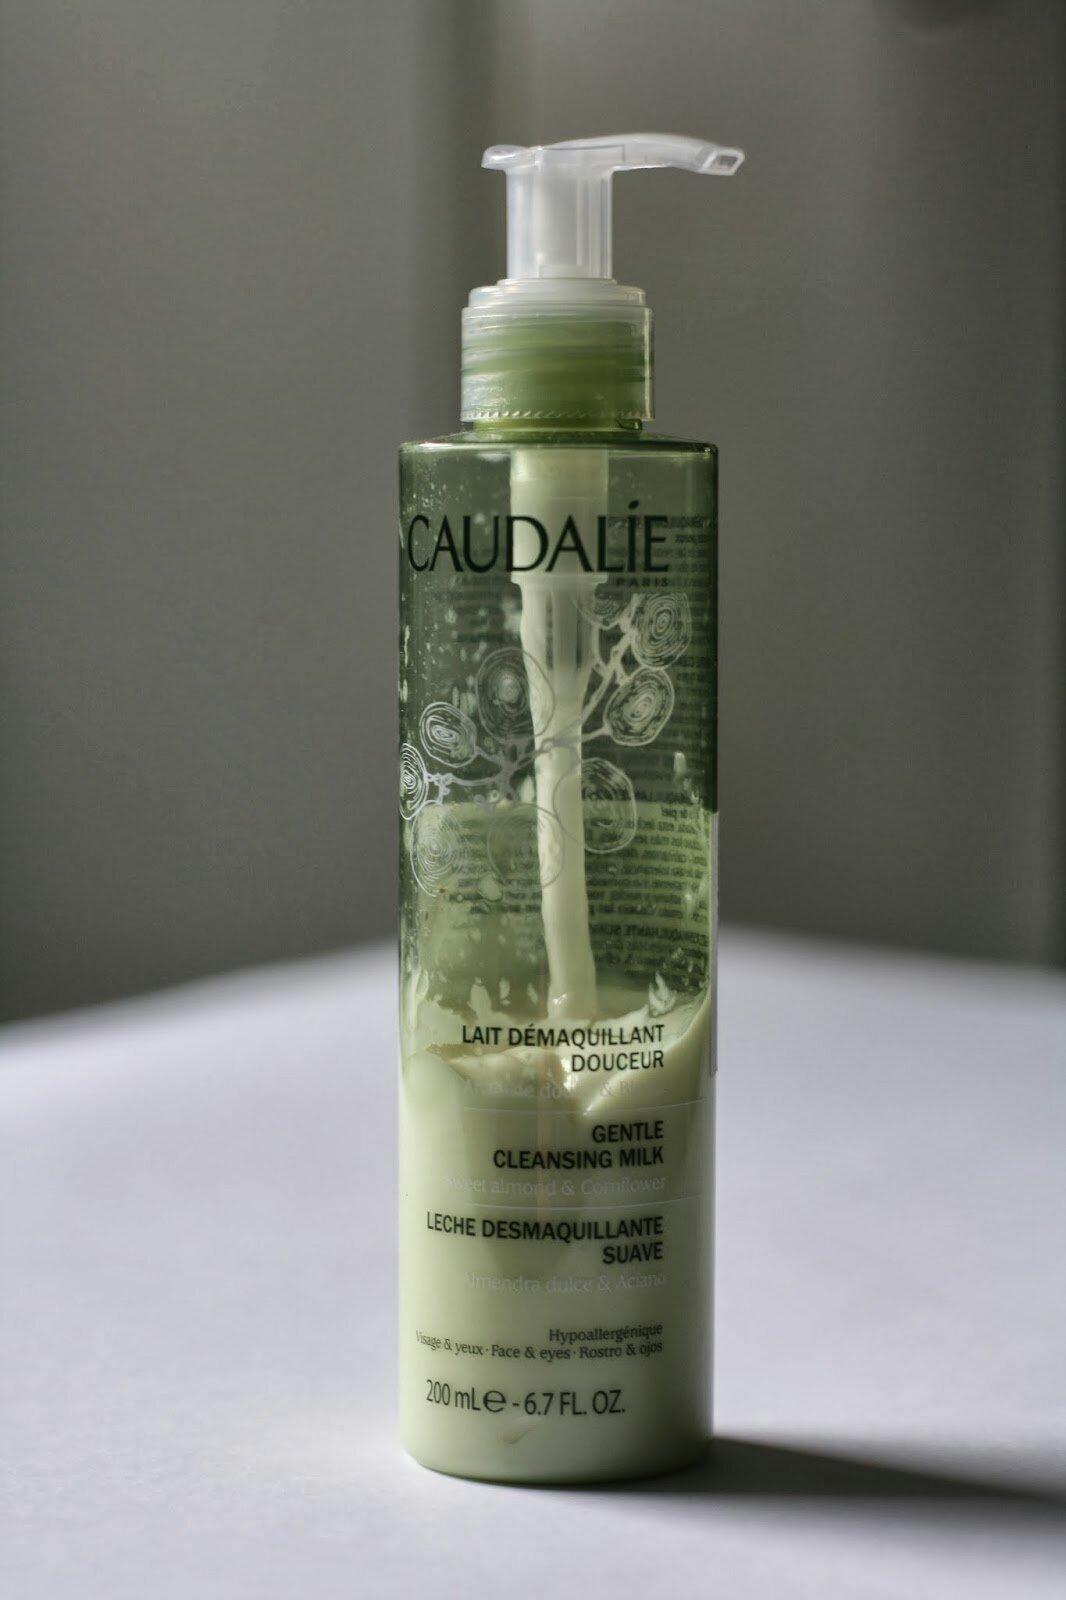 Review sữa rửa mặt Caudalie Gentle Cleasing Milk